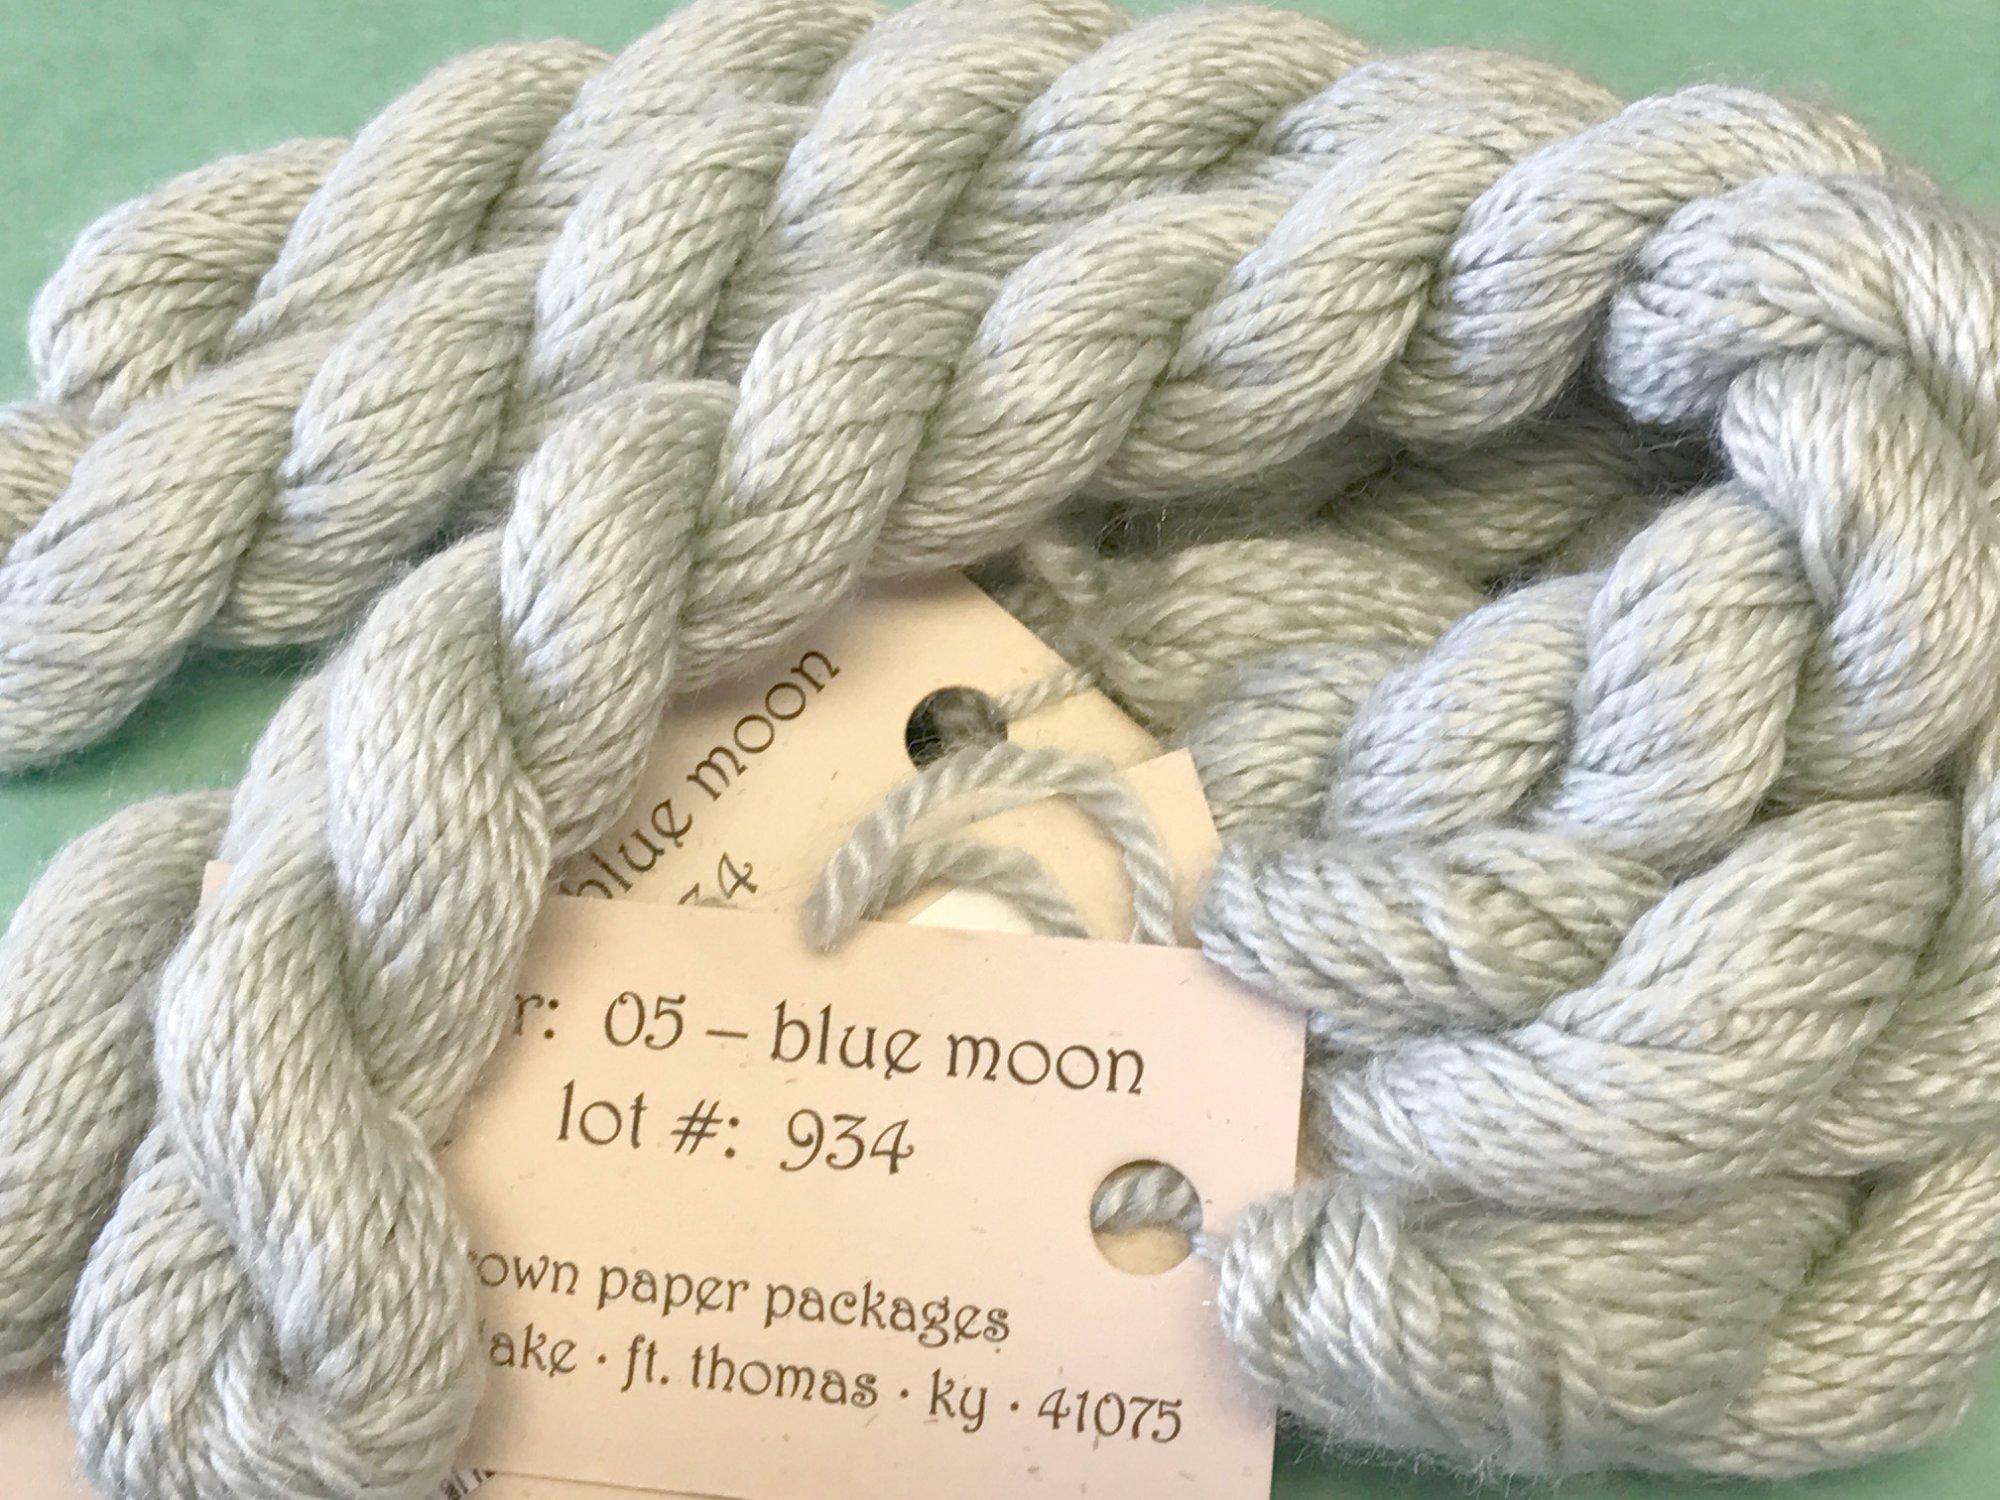 SI-BLUE MOON-05